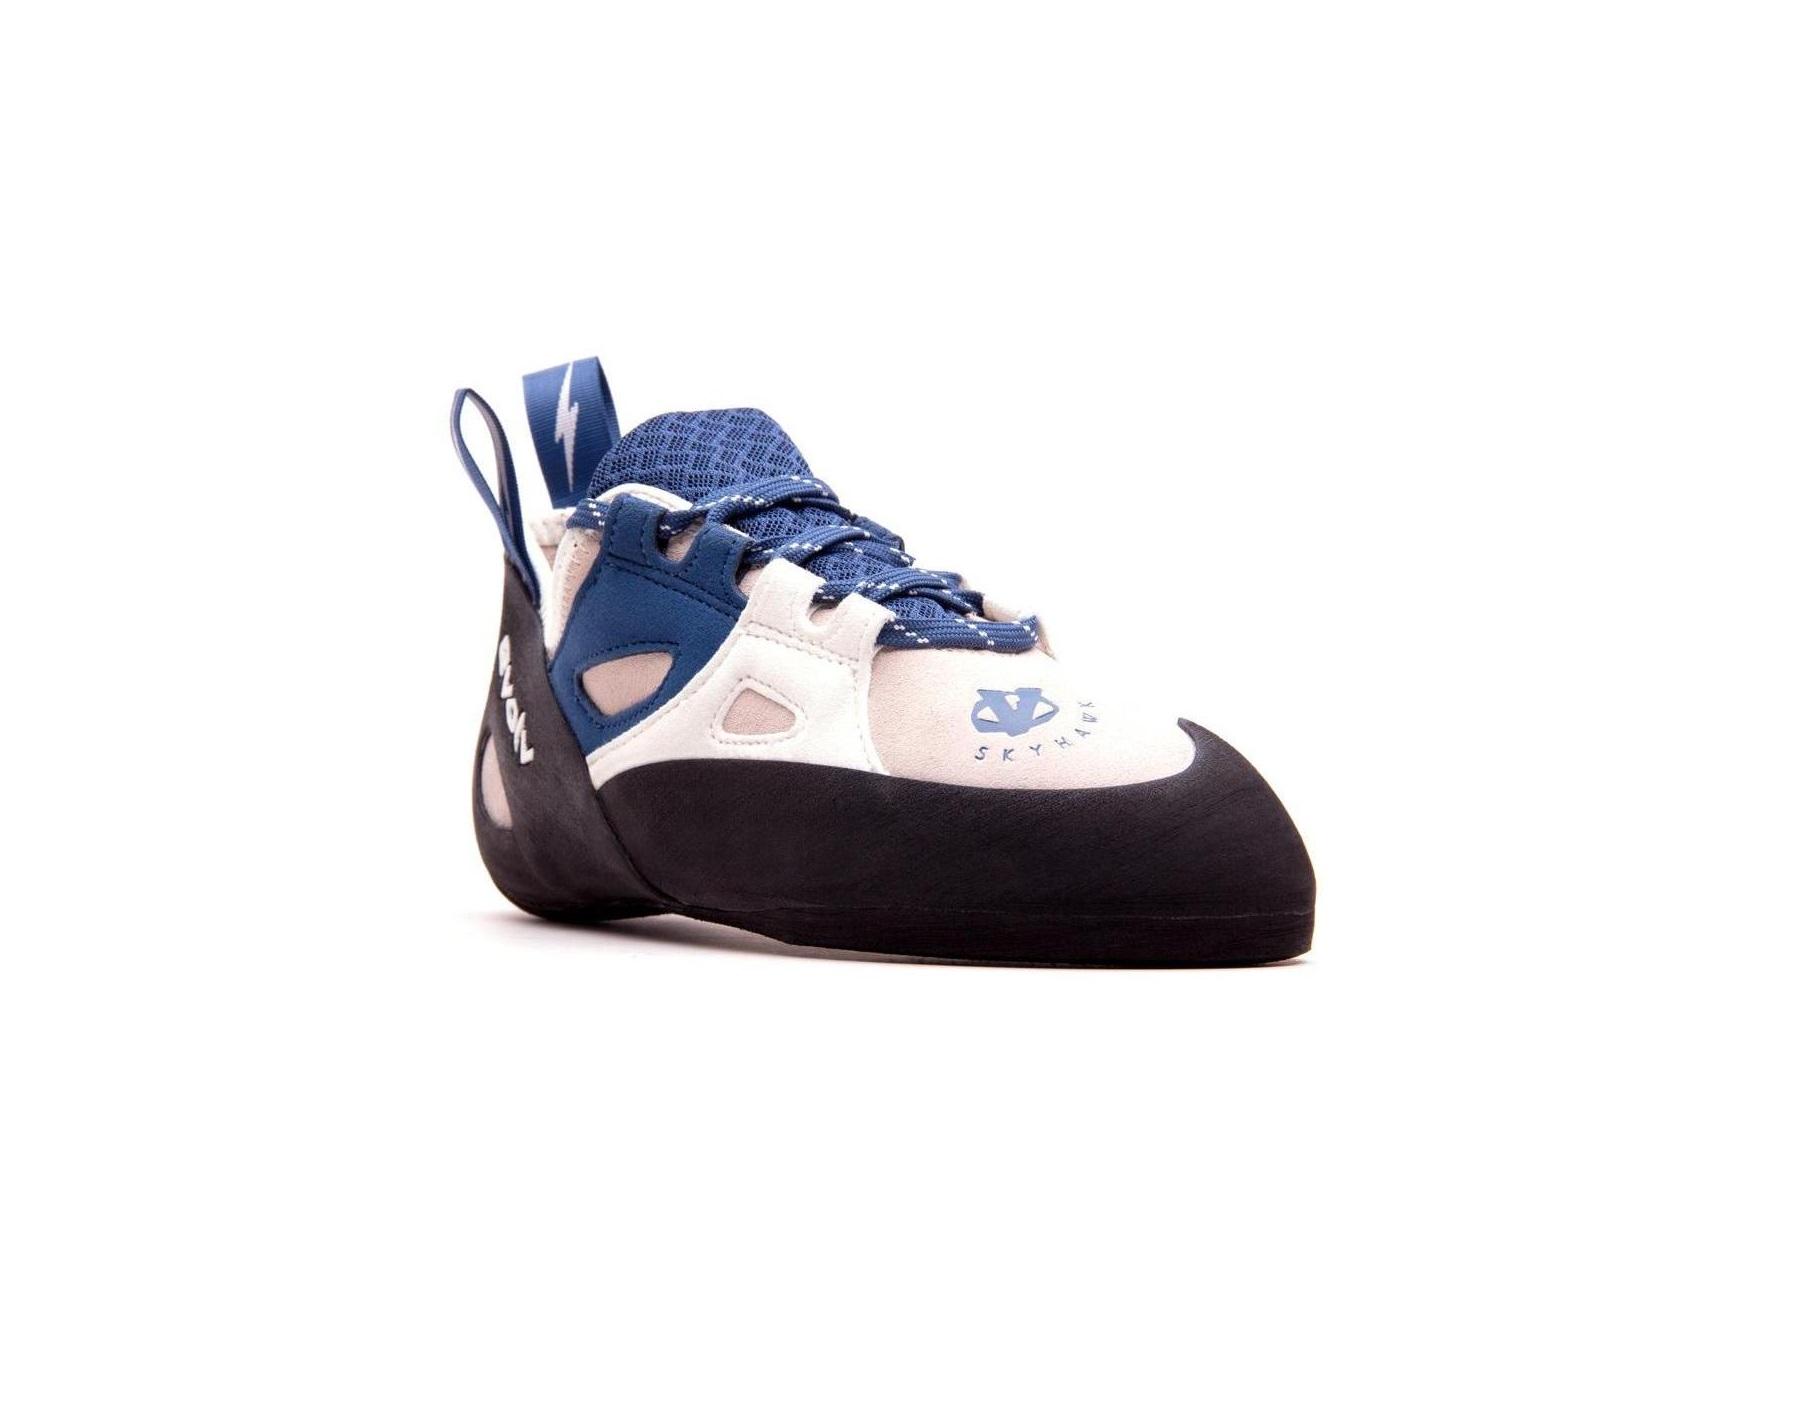 Скальные туфли Evolv 2020 Skyhawk white/blue